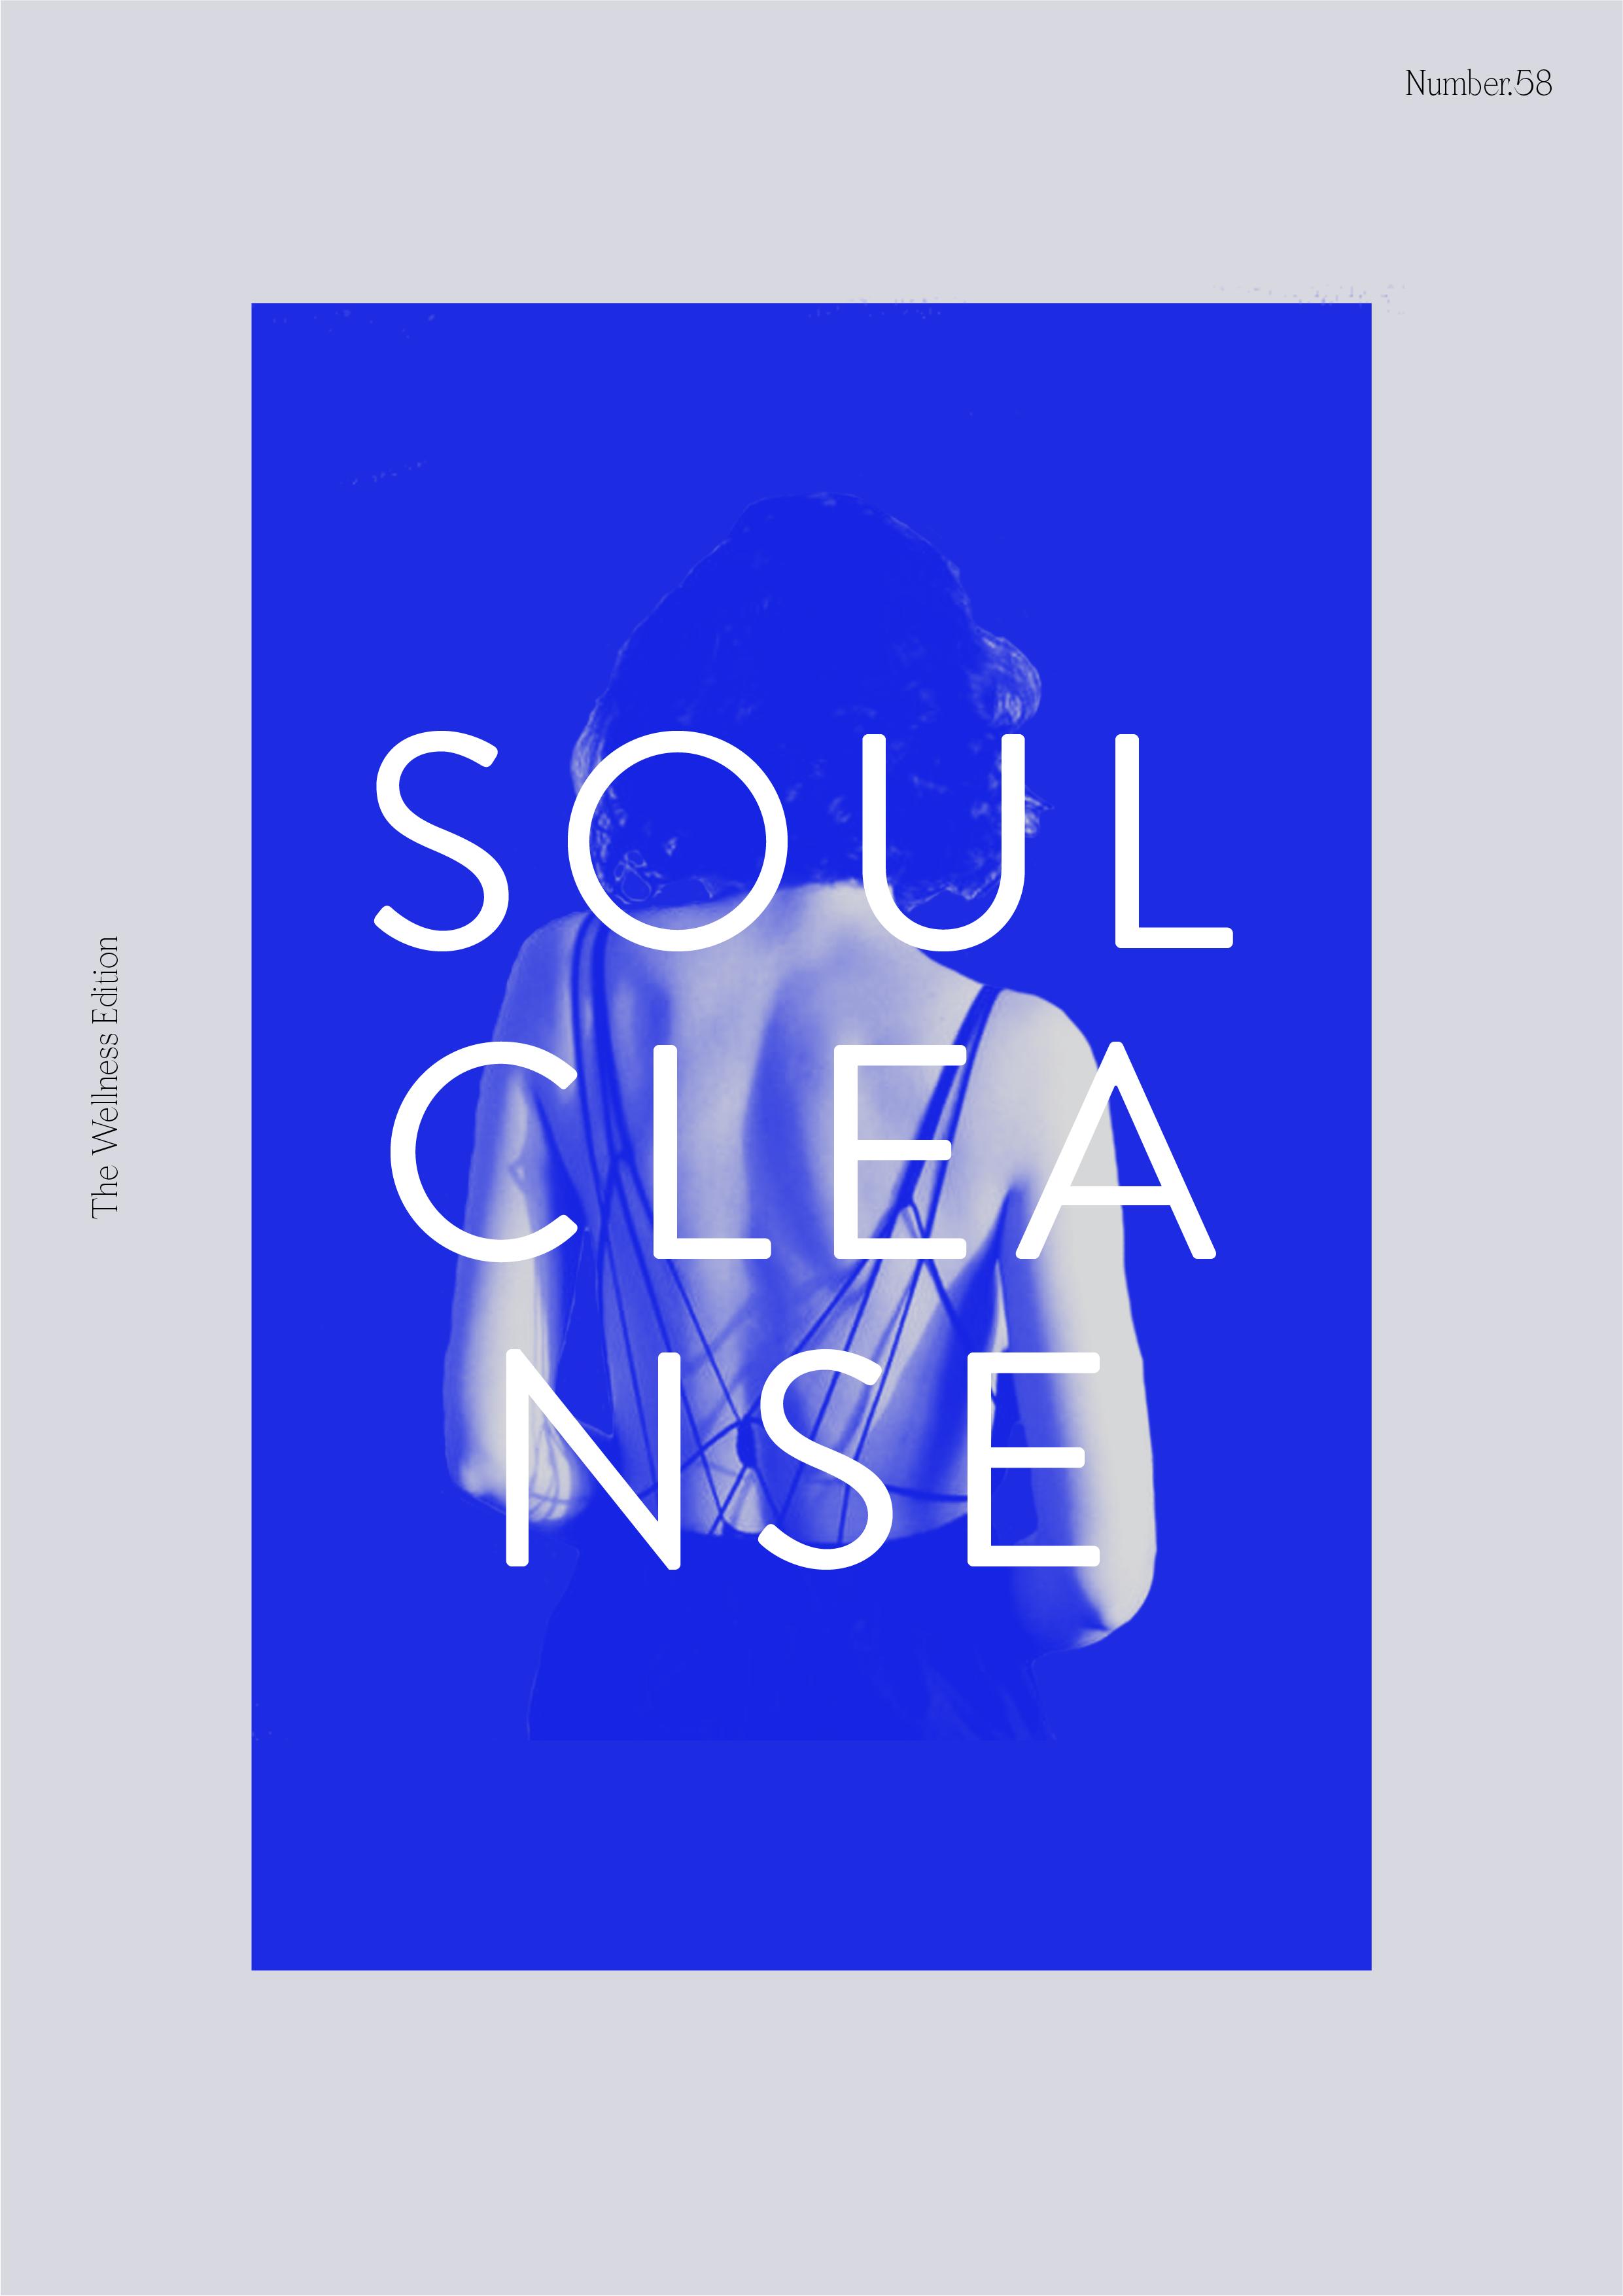 The Wellness Edition NO.58 // Soul Cleanse (Phylleli Design Studio, Self-Care Blog and Onlineshop) #soulcleanse #mentalhealth #selflove #selfcare #selfdevelopment #selfcareblog #selfcareblogger #mentalhealth #loveyourself #selfcare #love #begoodtoyourself #design #layout #editorialdesign #minimalism #designblog #lifestyleblog #selfhelp #spiritjunkie #selfdevelopmentjunkie